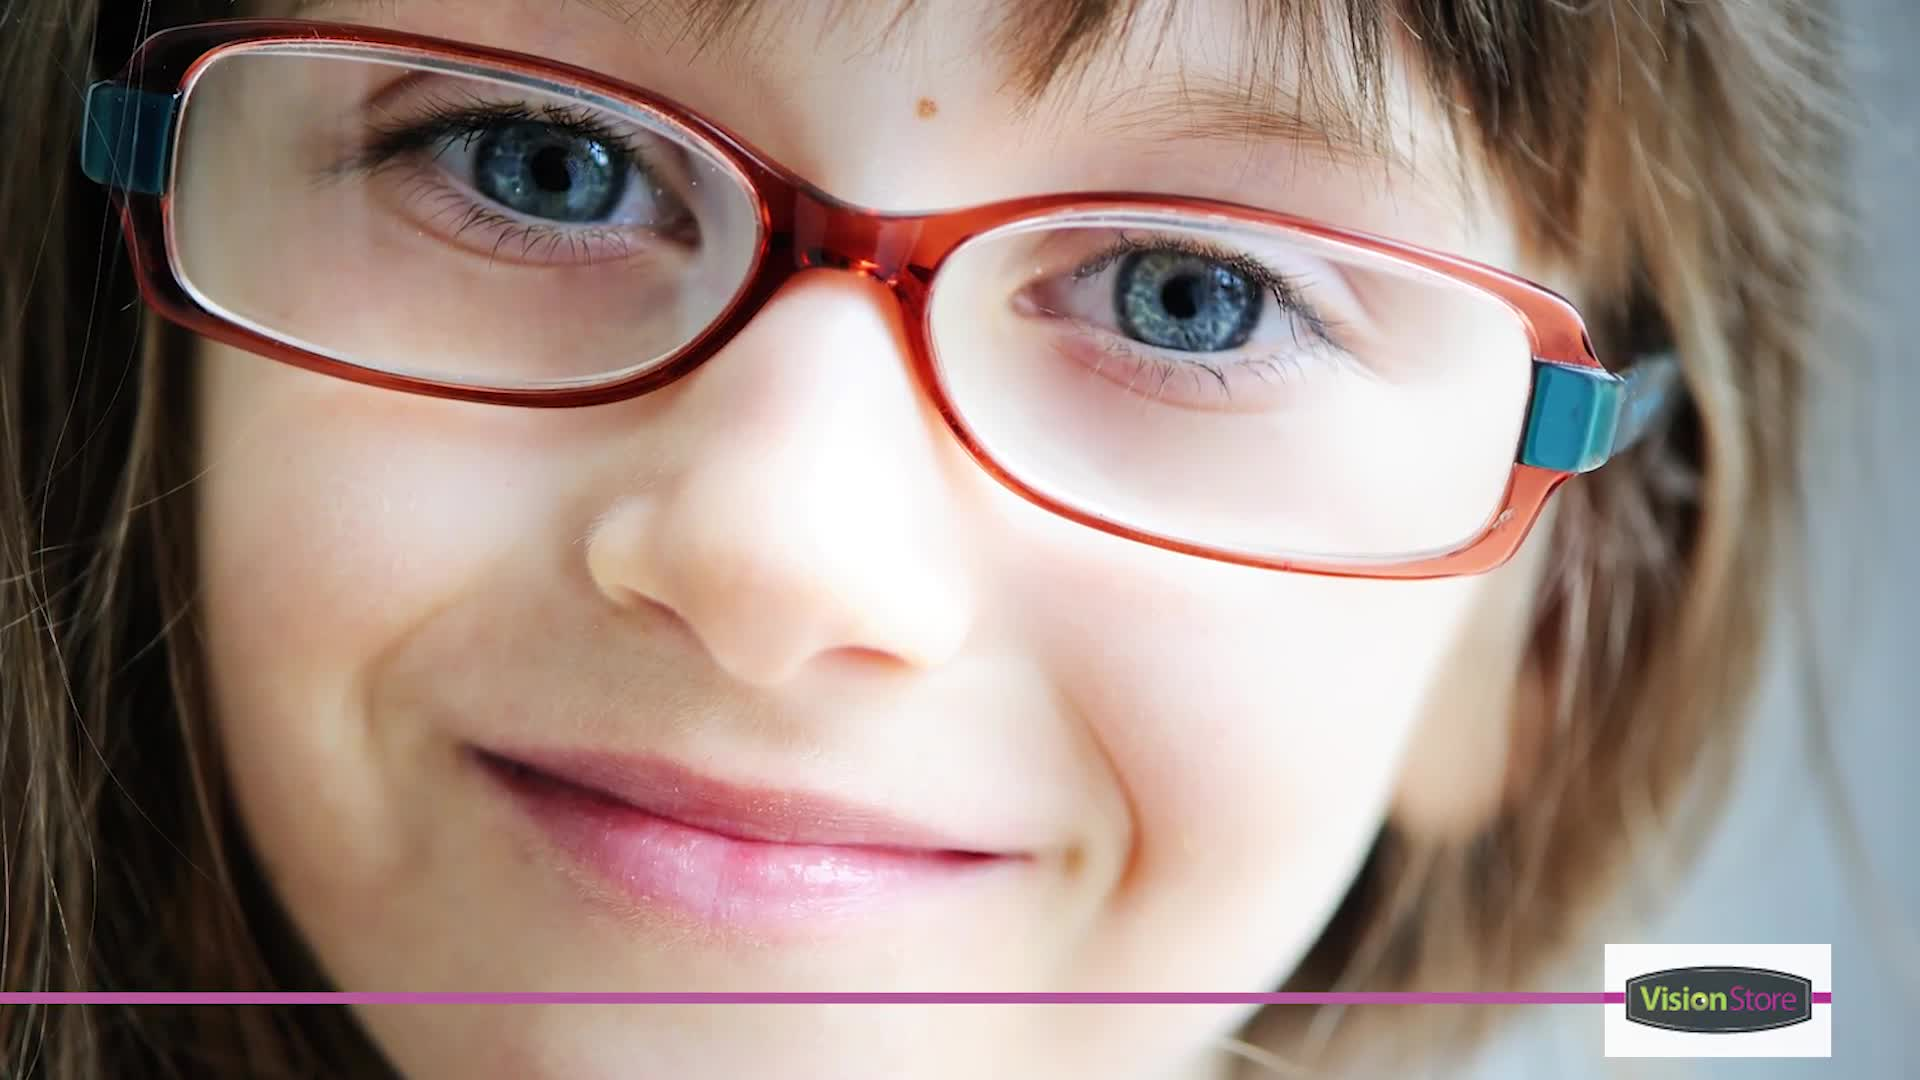 Vision Store - Eyeglasses & Eyewear - 705-726-2020